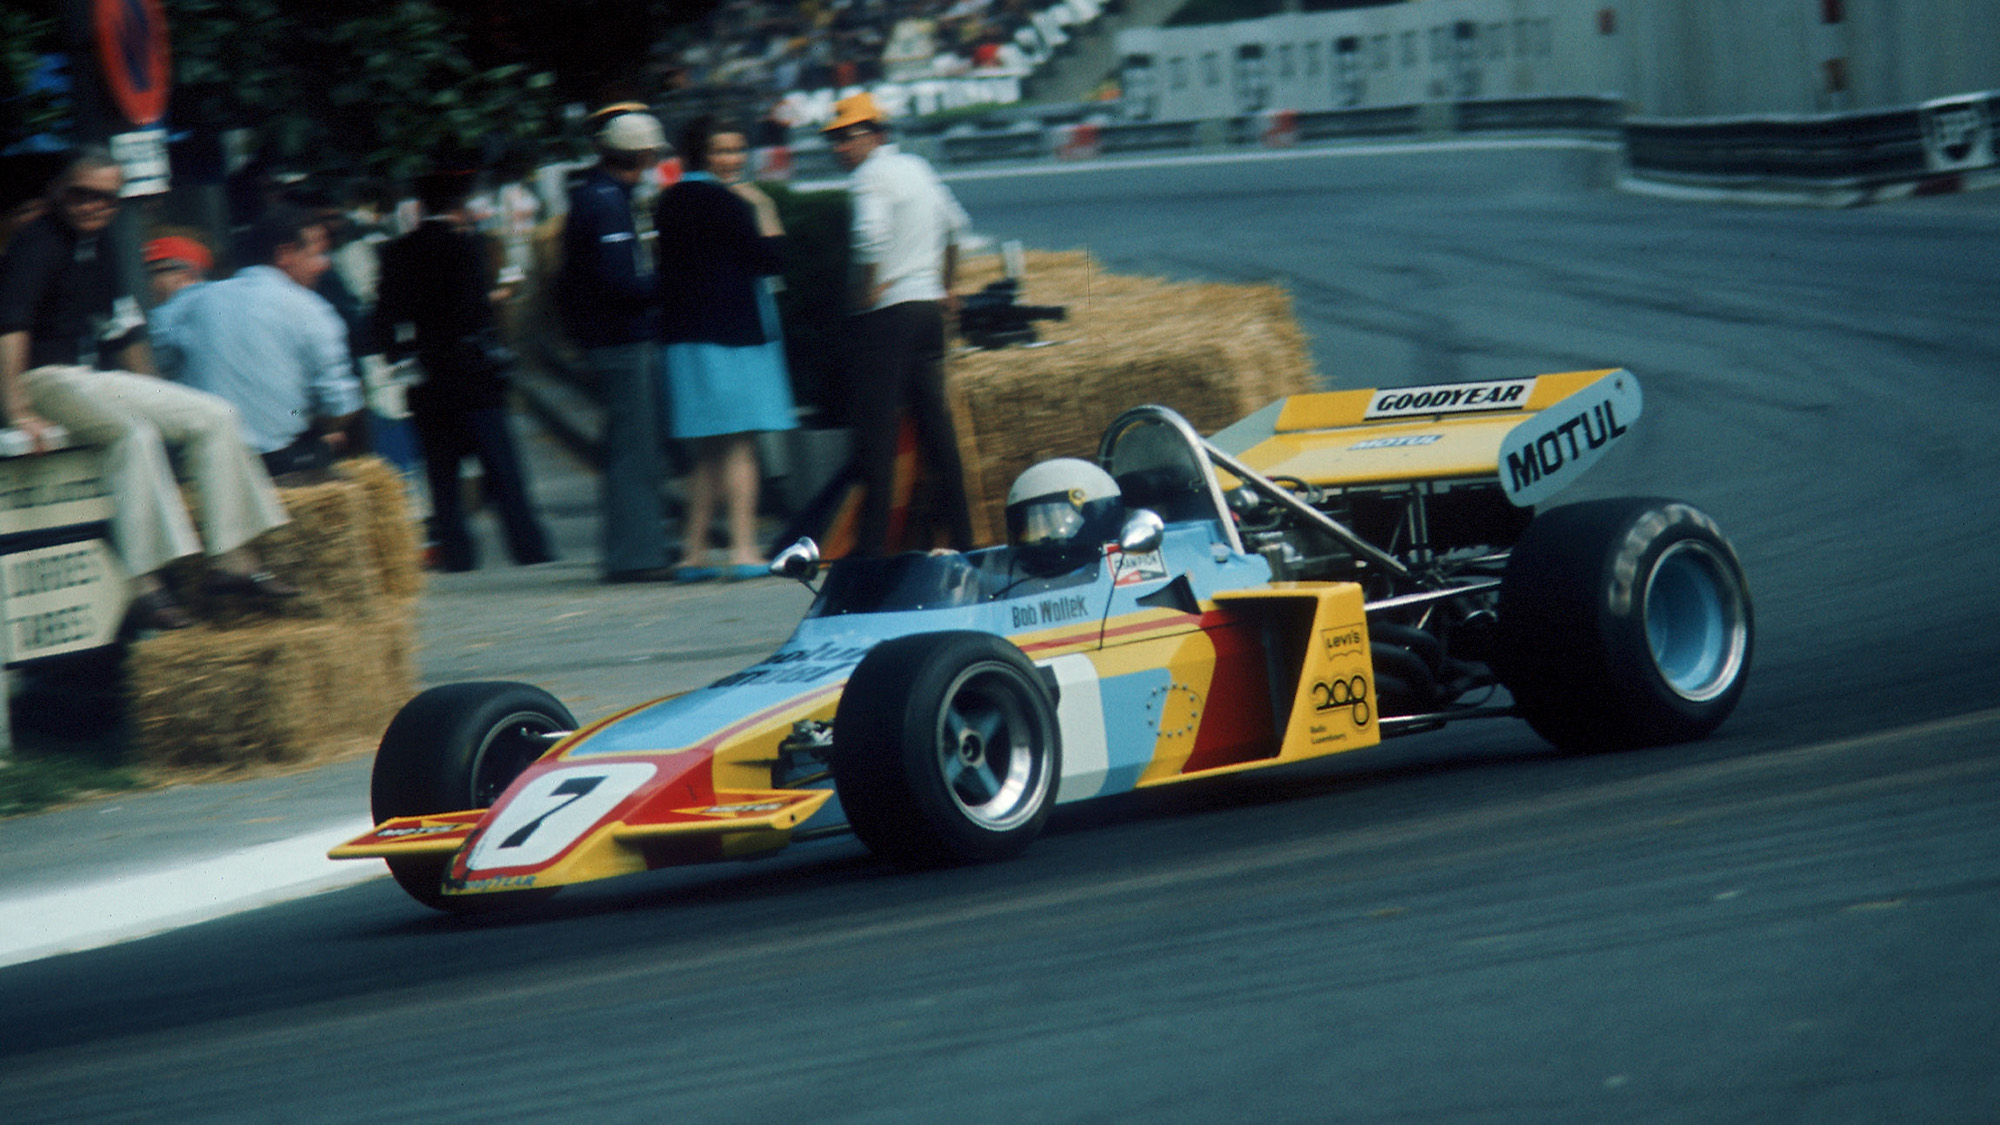 Bob Wollek driving for Rondel at the 1972 Pau Grand Prix